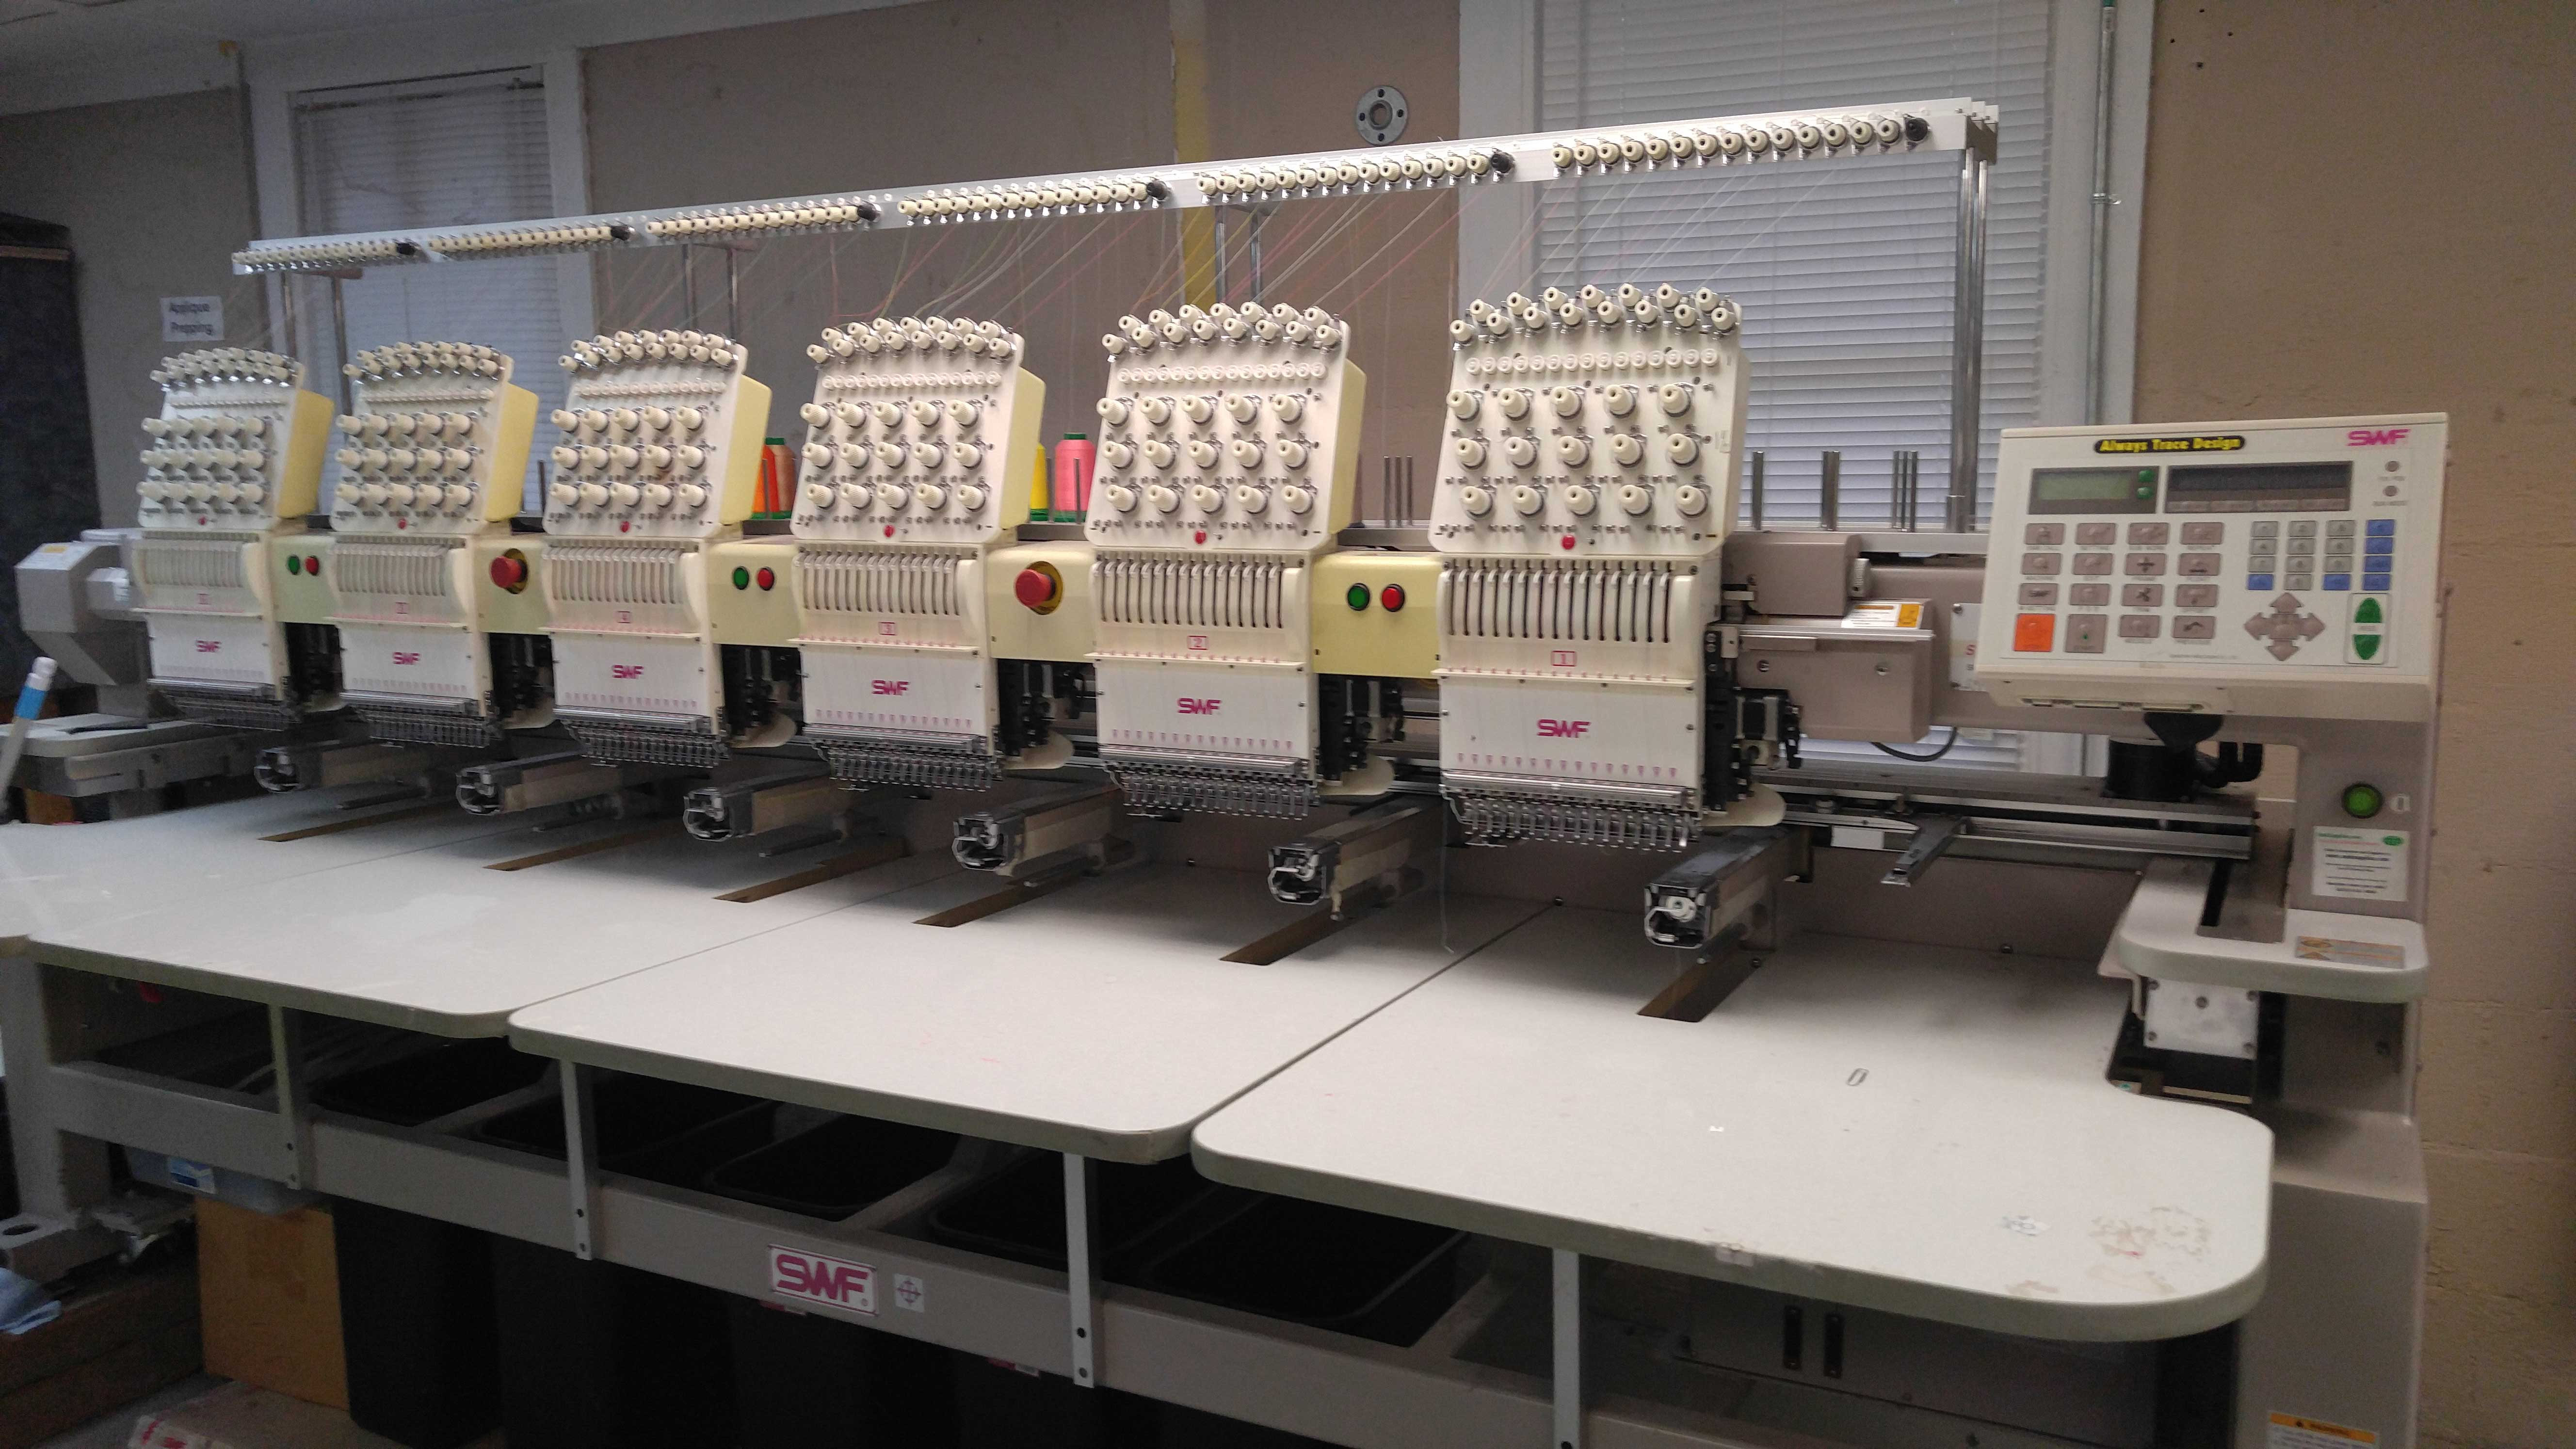 swf 6 needle embroidery machine